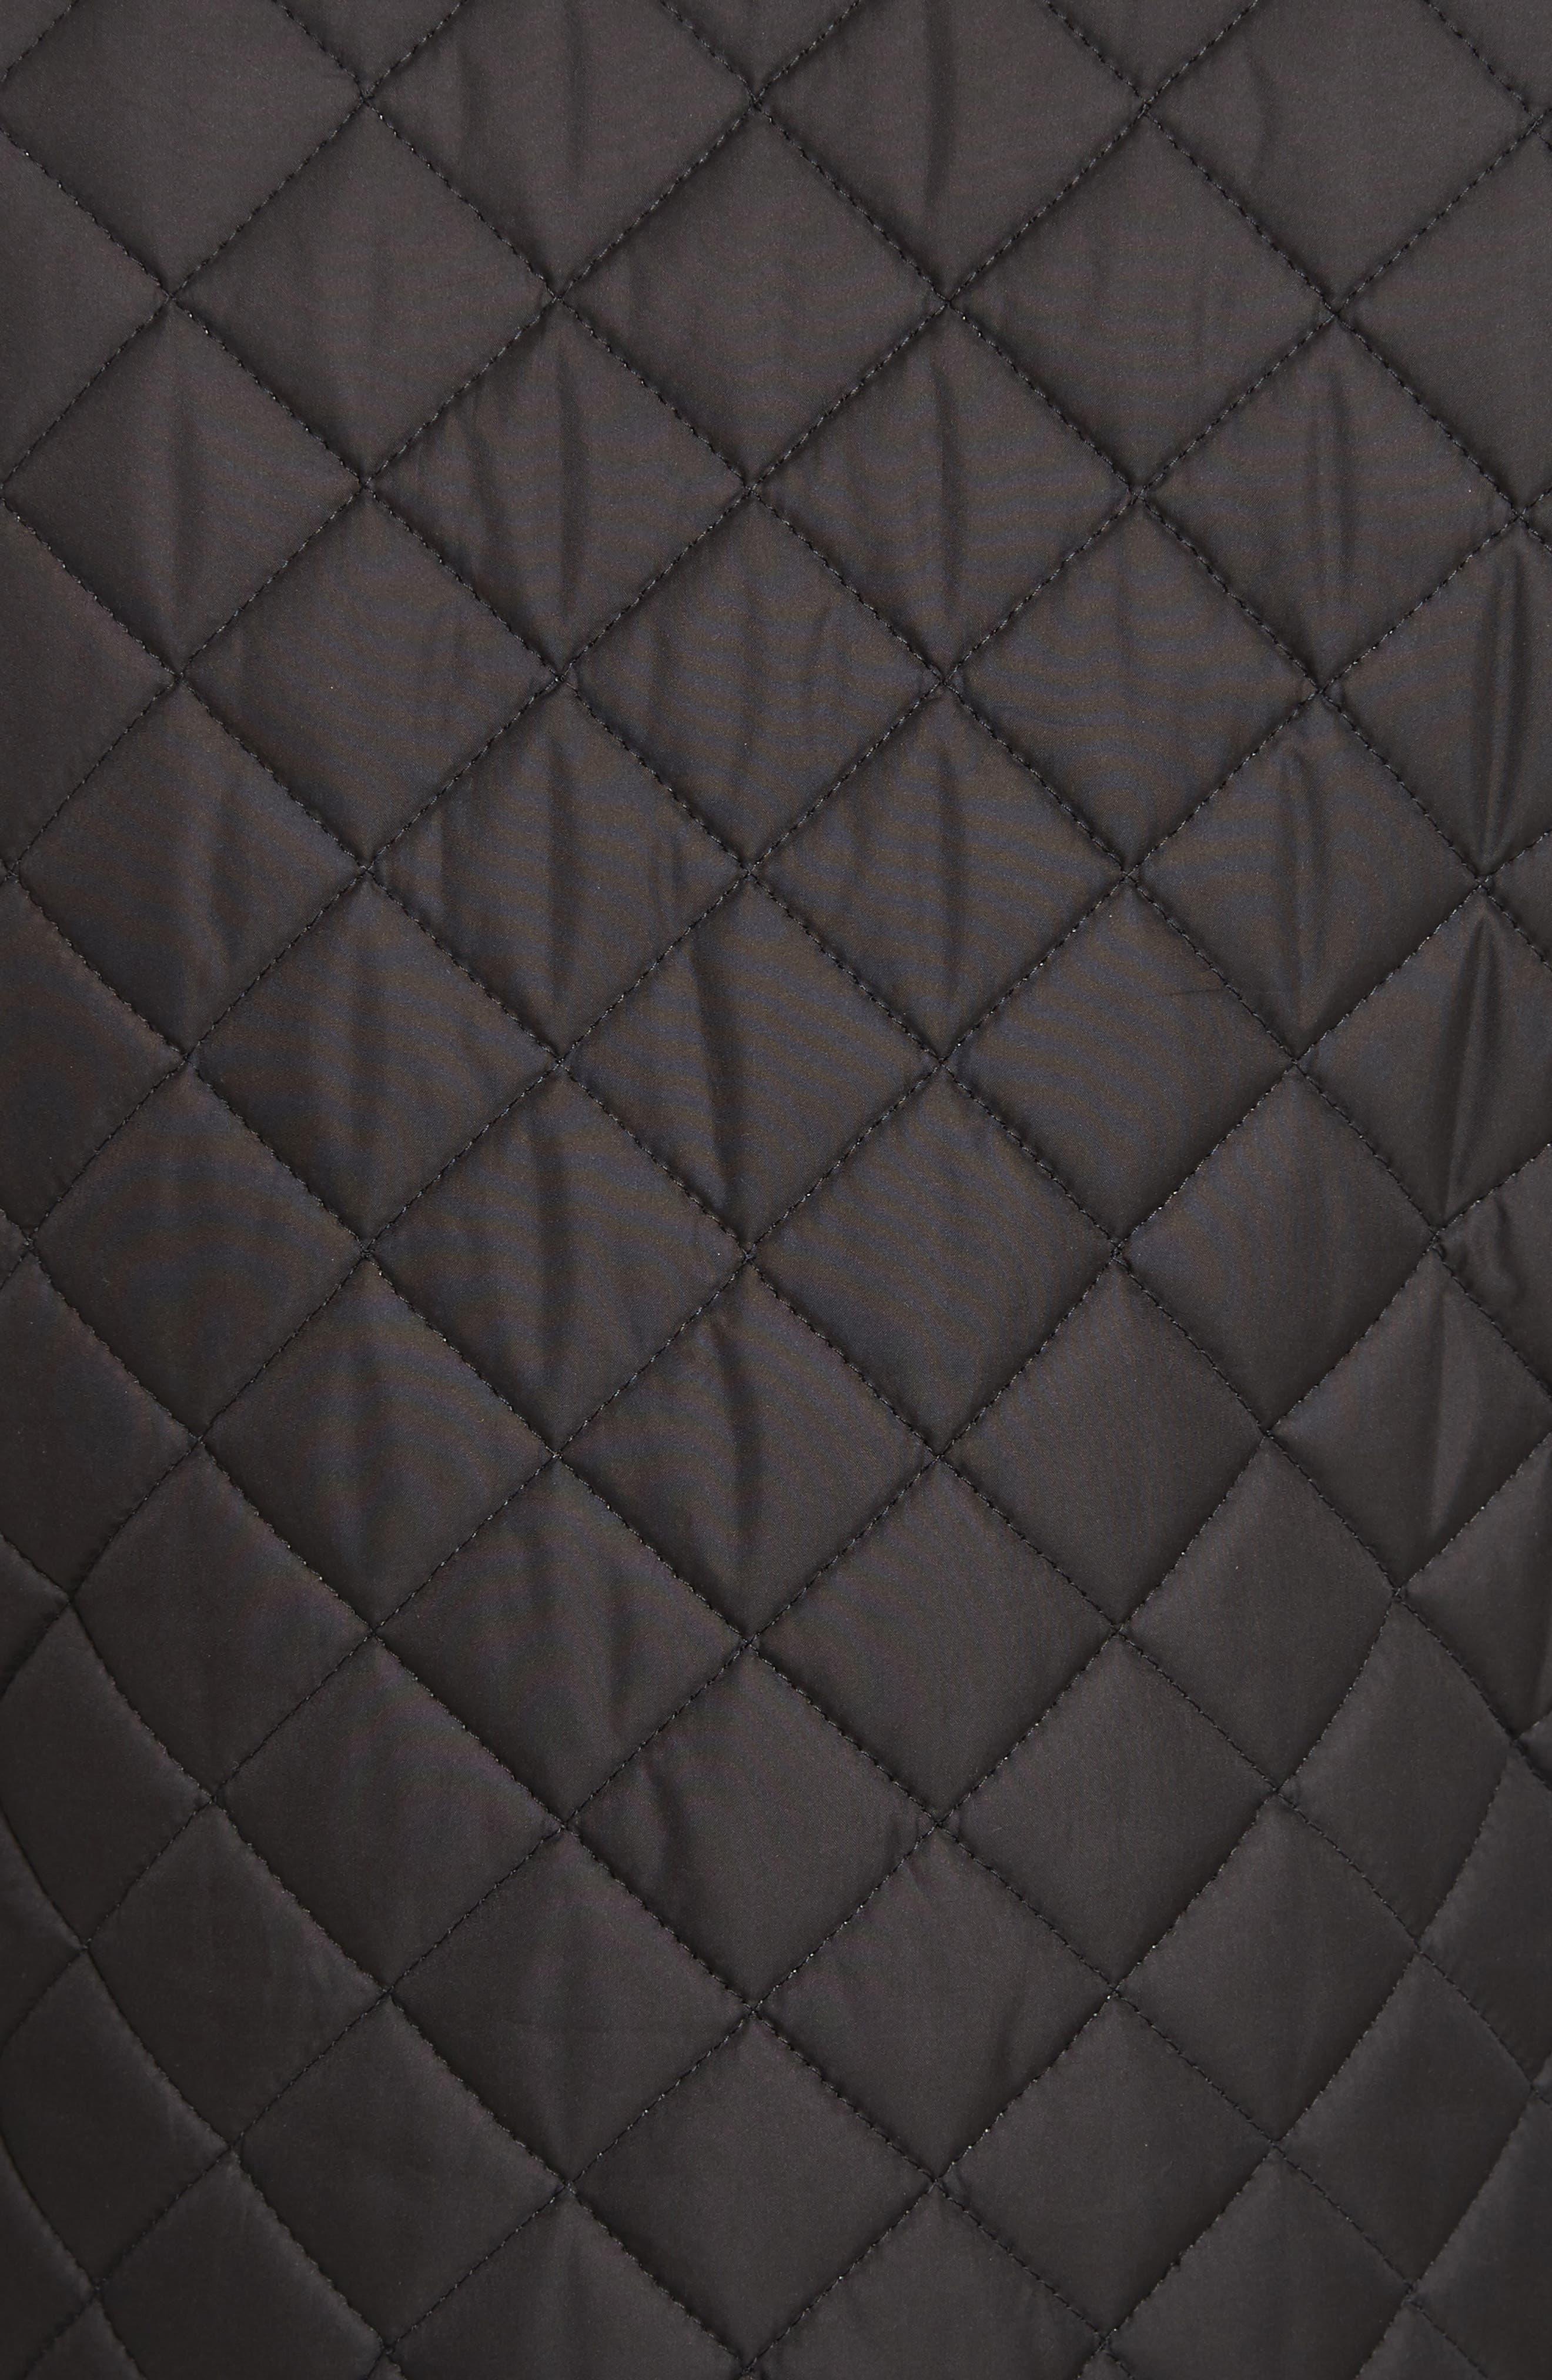 Waistcoat Tech Quilted Vest,                             Alternate thumbnail 5, color,                             Black